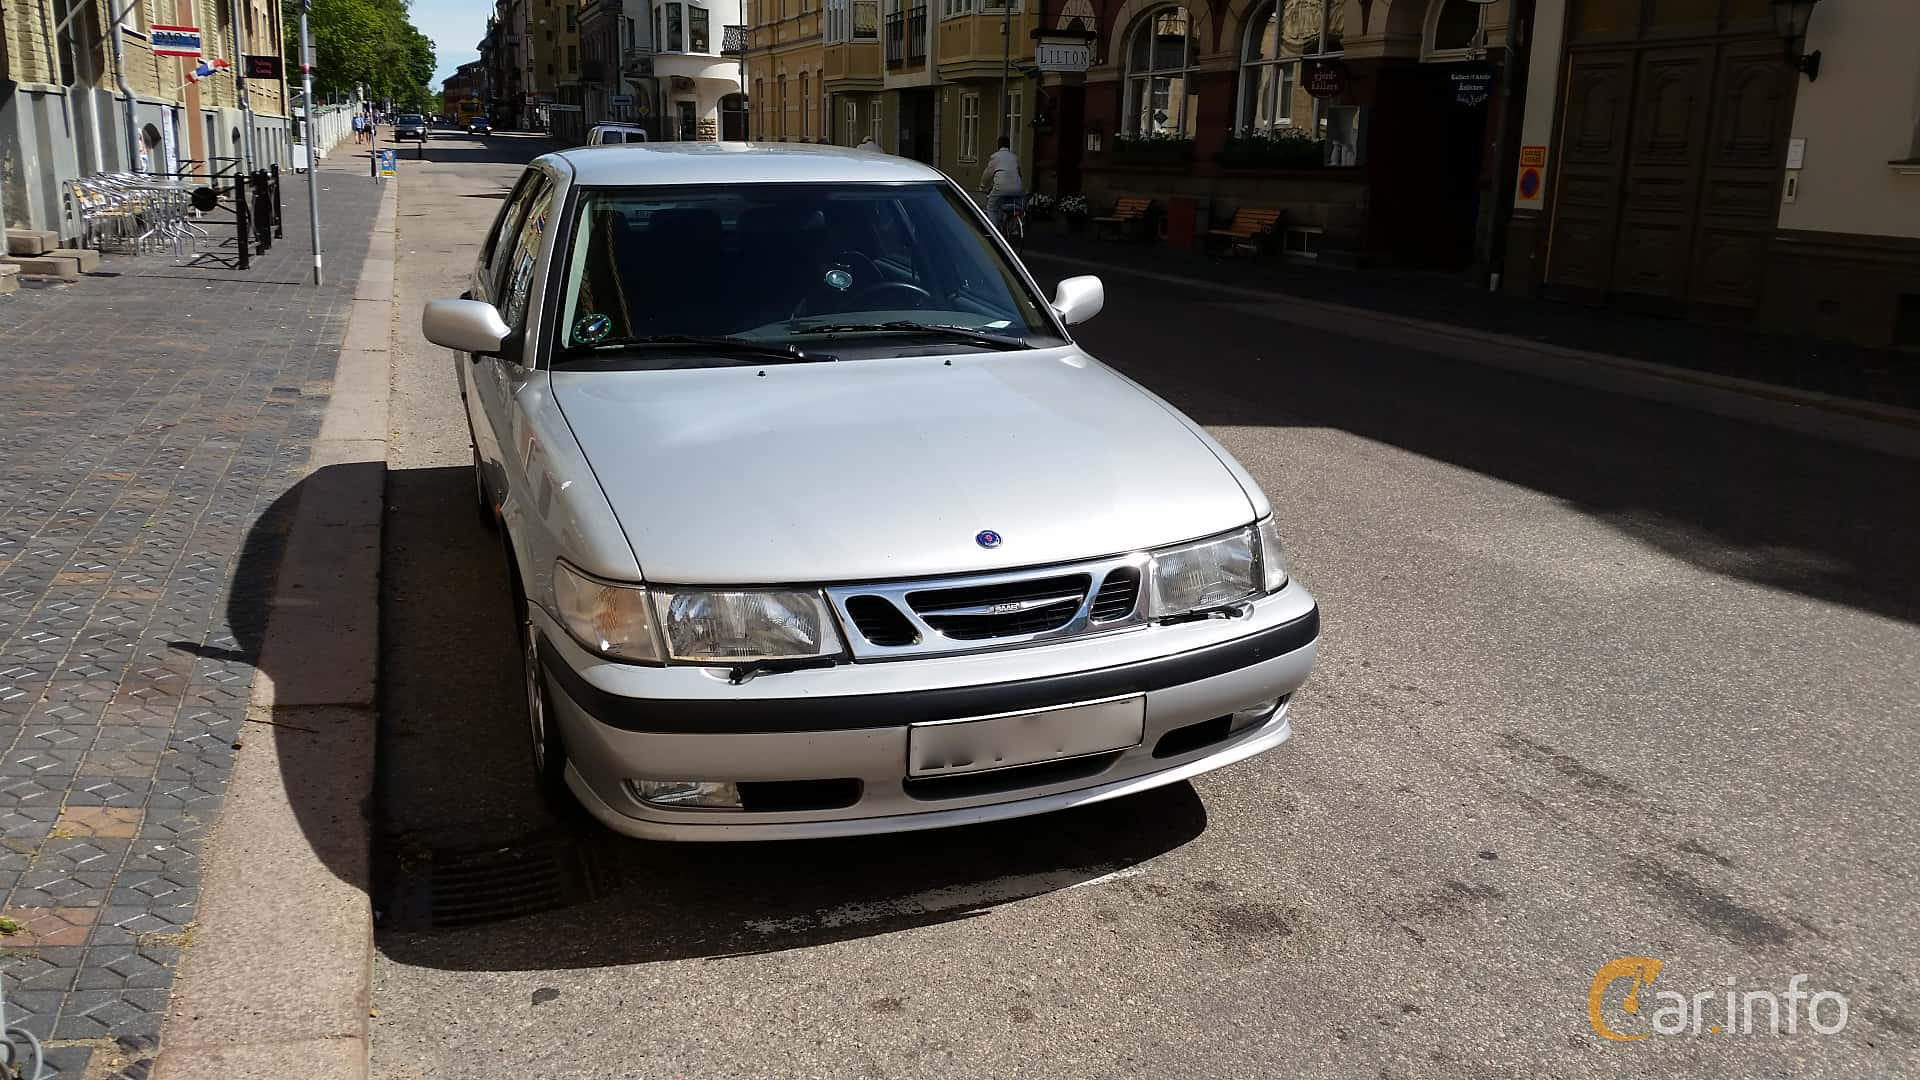 3 images of saab 9 3 5 door 2 0 t manual 154hp 1999 by jonasbonde rh car info 1999 saab 9-3 manual climate control 1999 saab 9-3 manual transmission